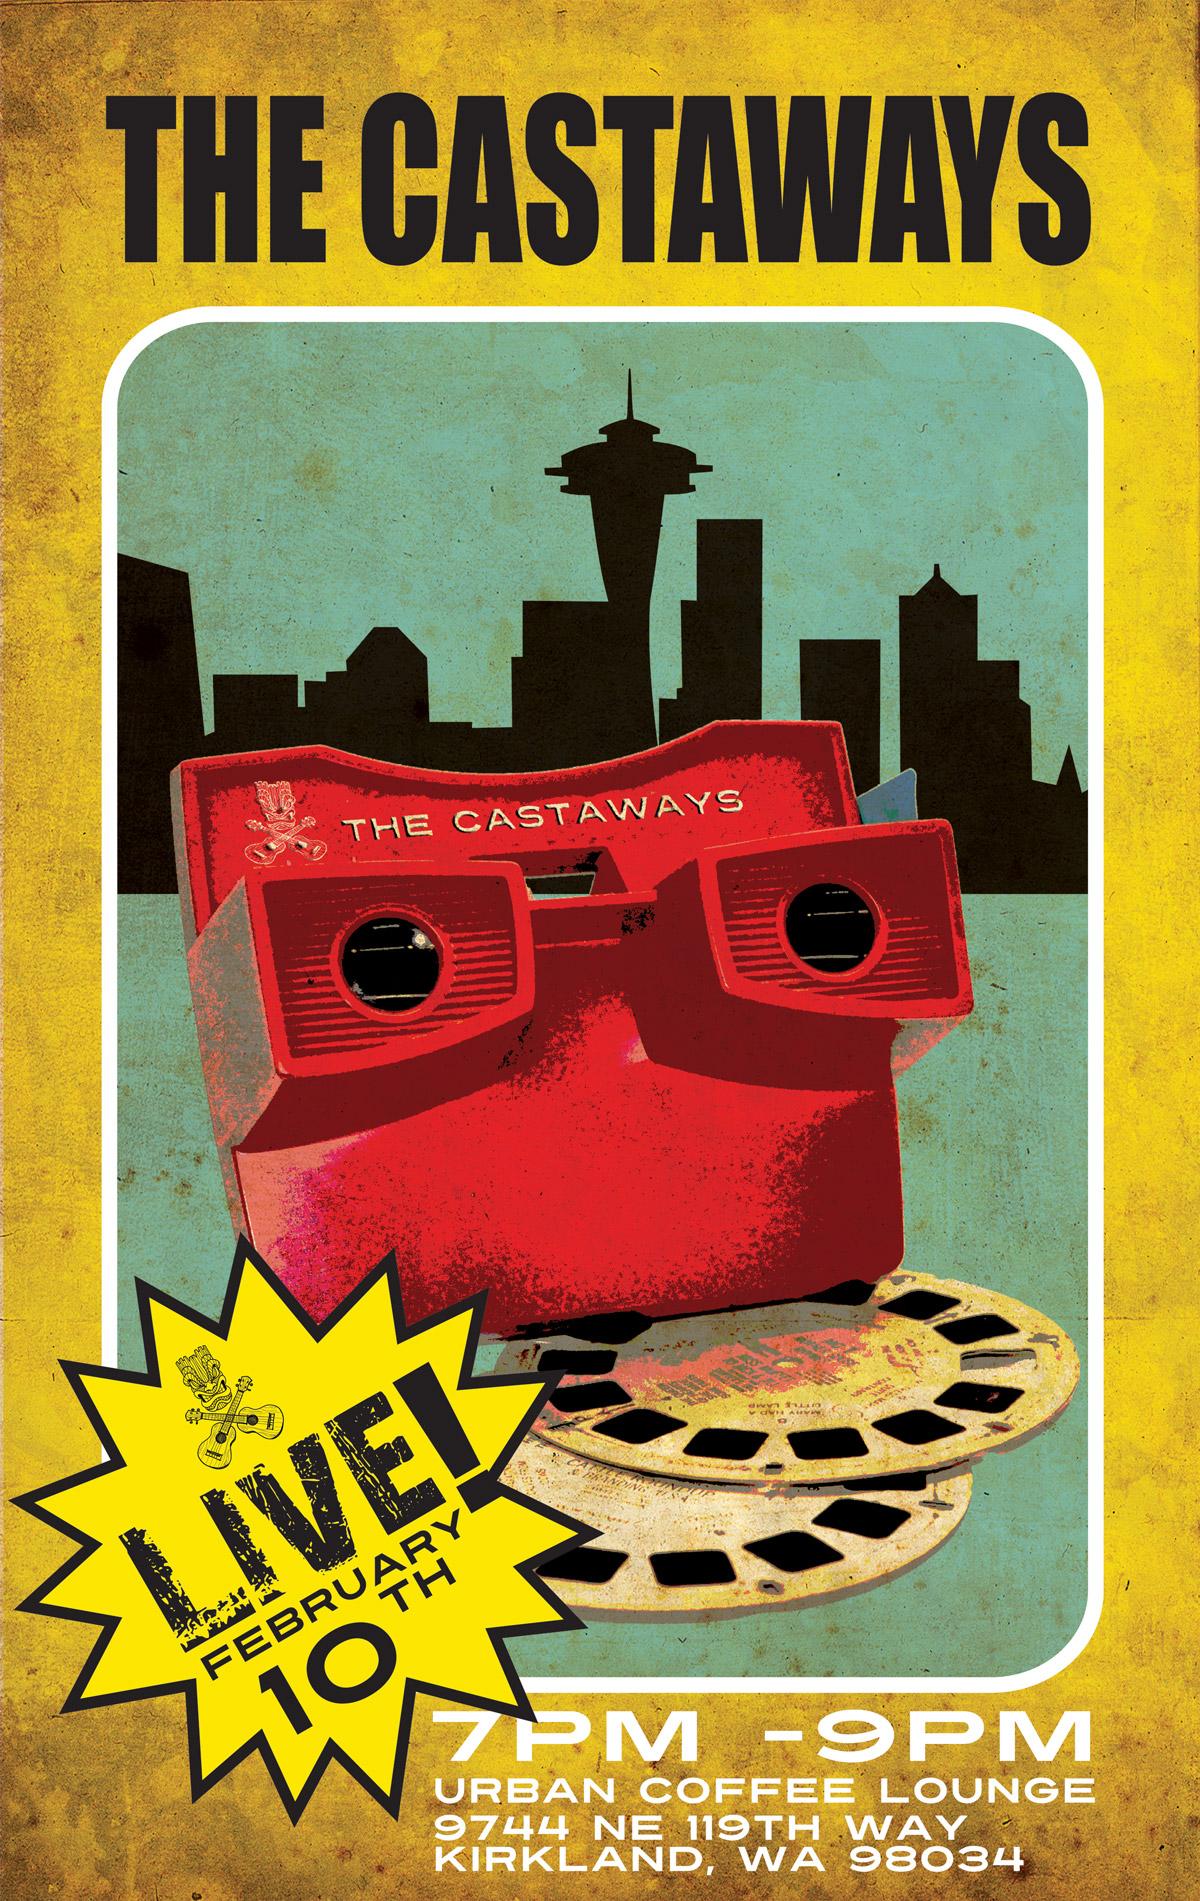 The Castaways at Urban Coffee Lounge - nerd's eye view